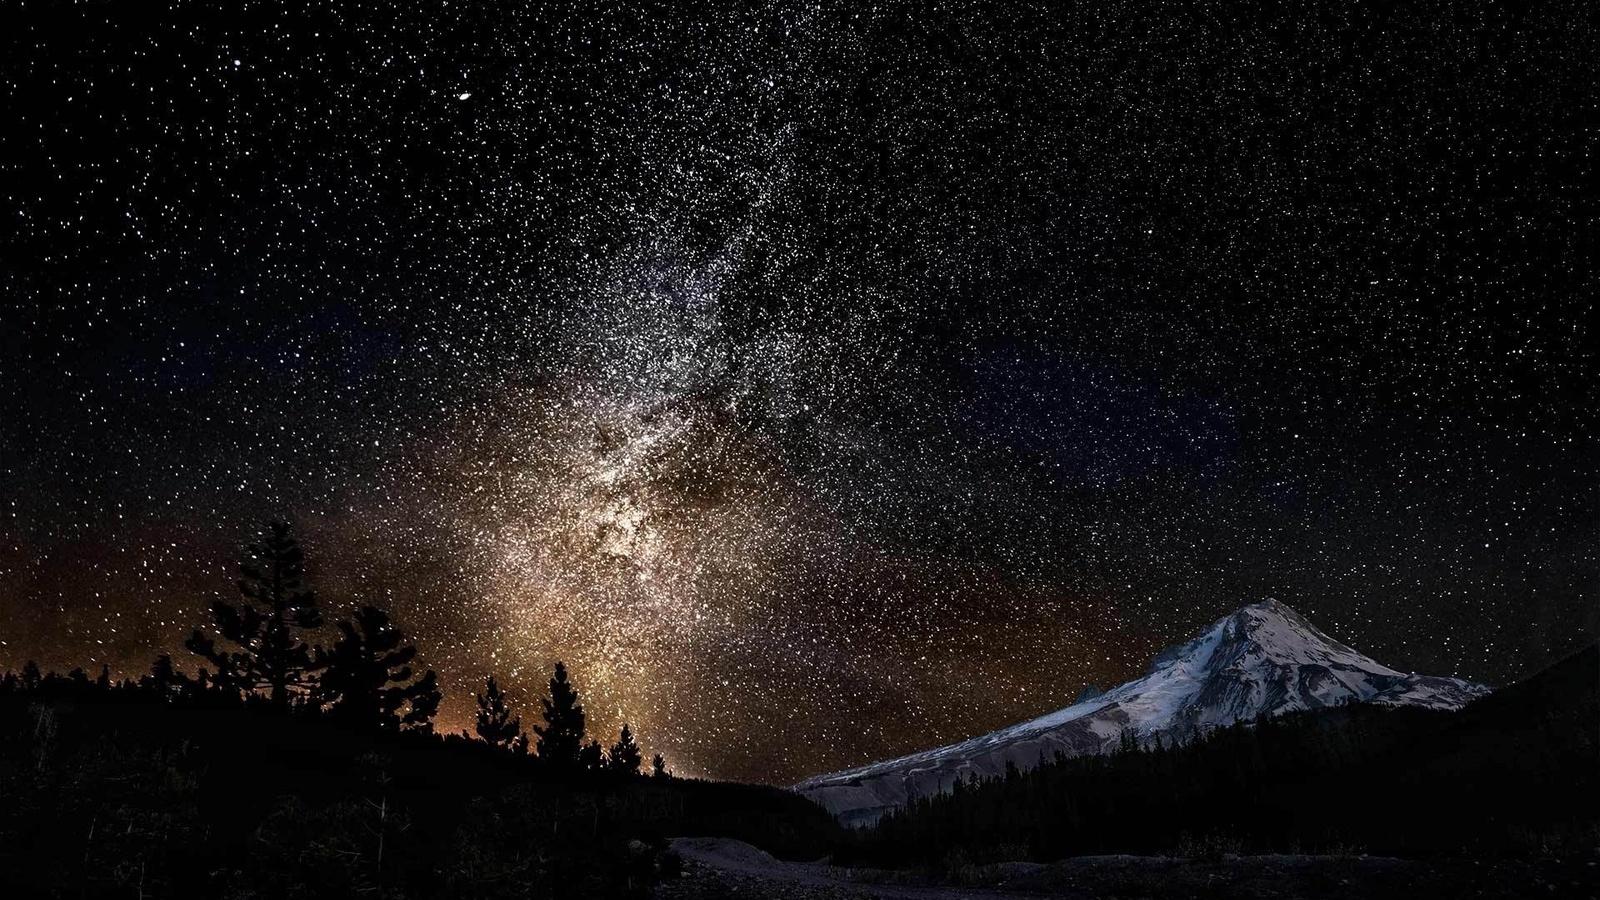 Звездное небо   картинки на рабочий стол телефона (1)